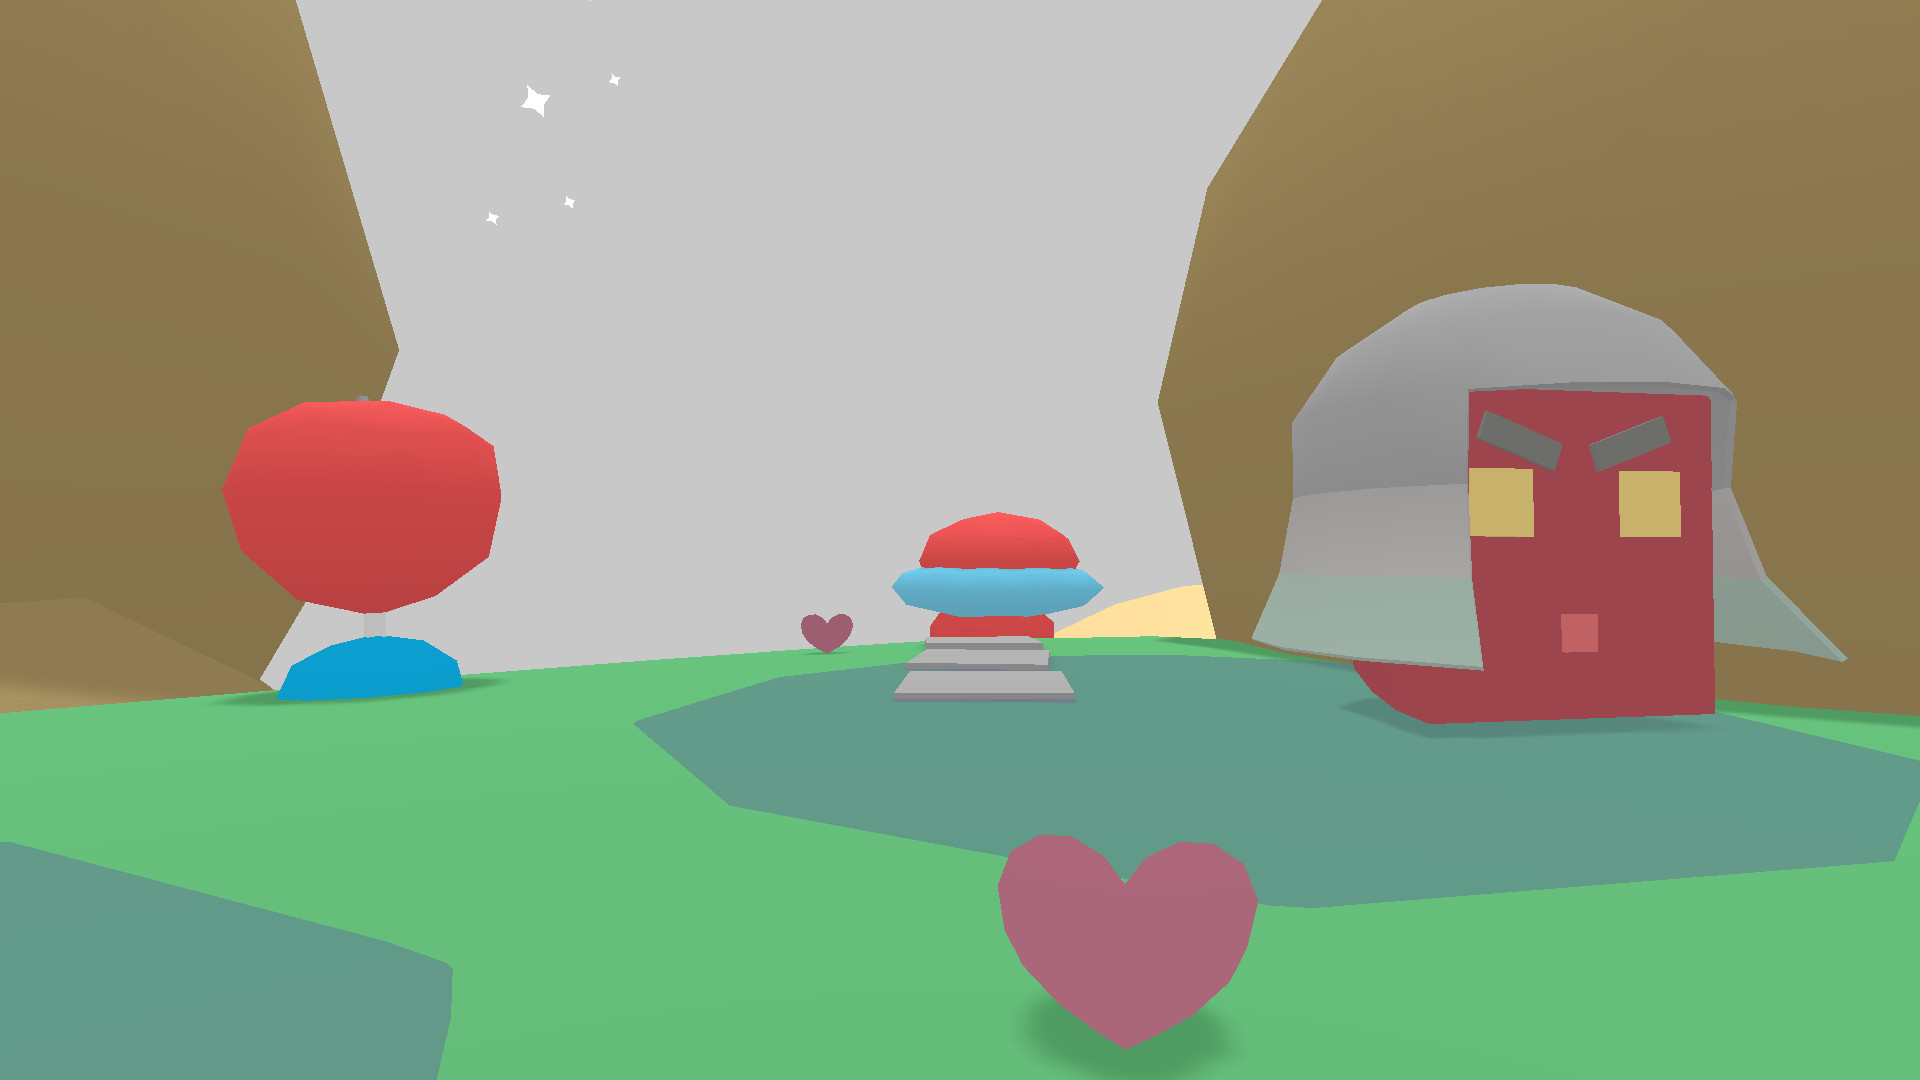 Lovely Planet 2 - April Skies